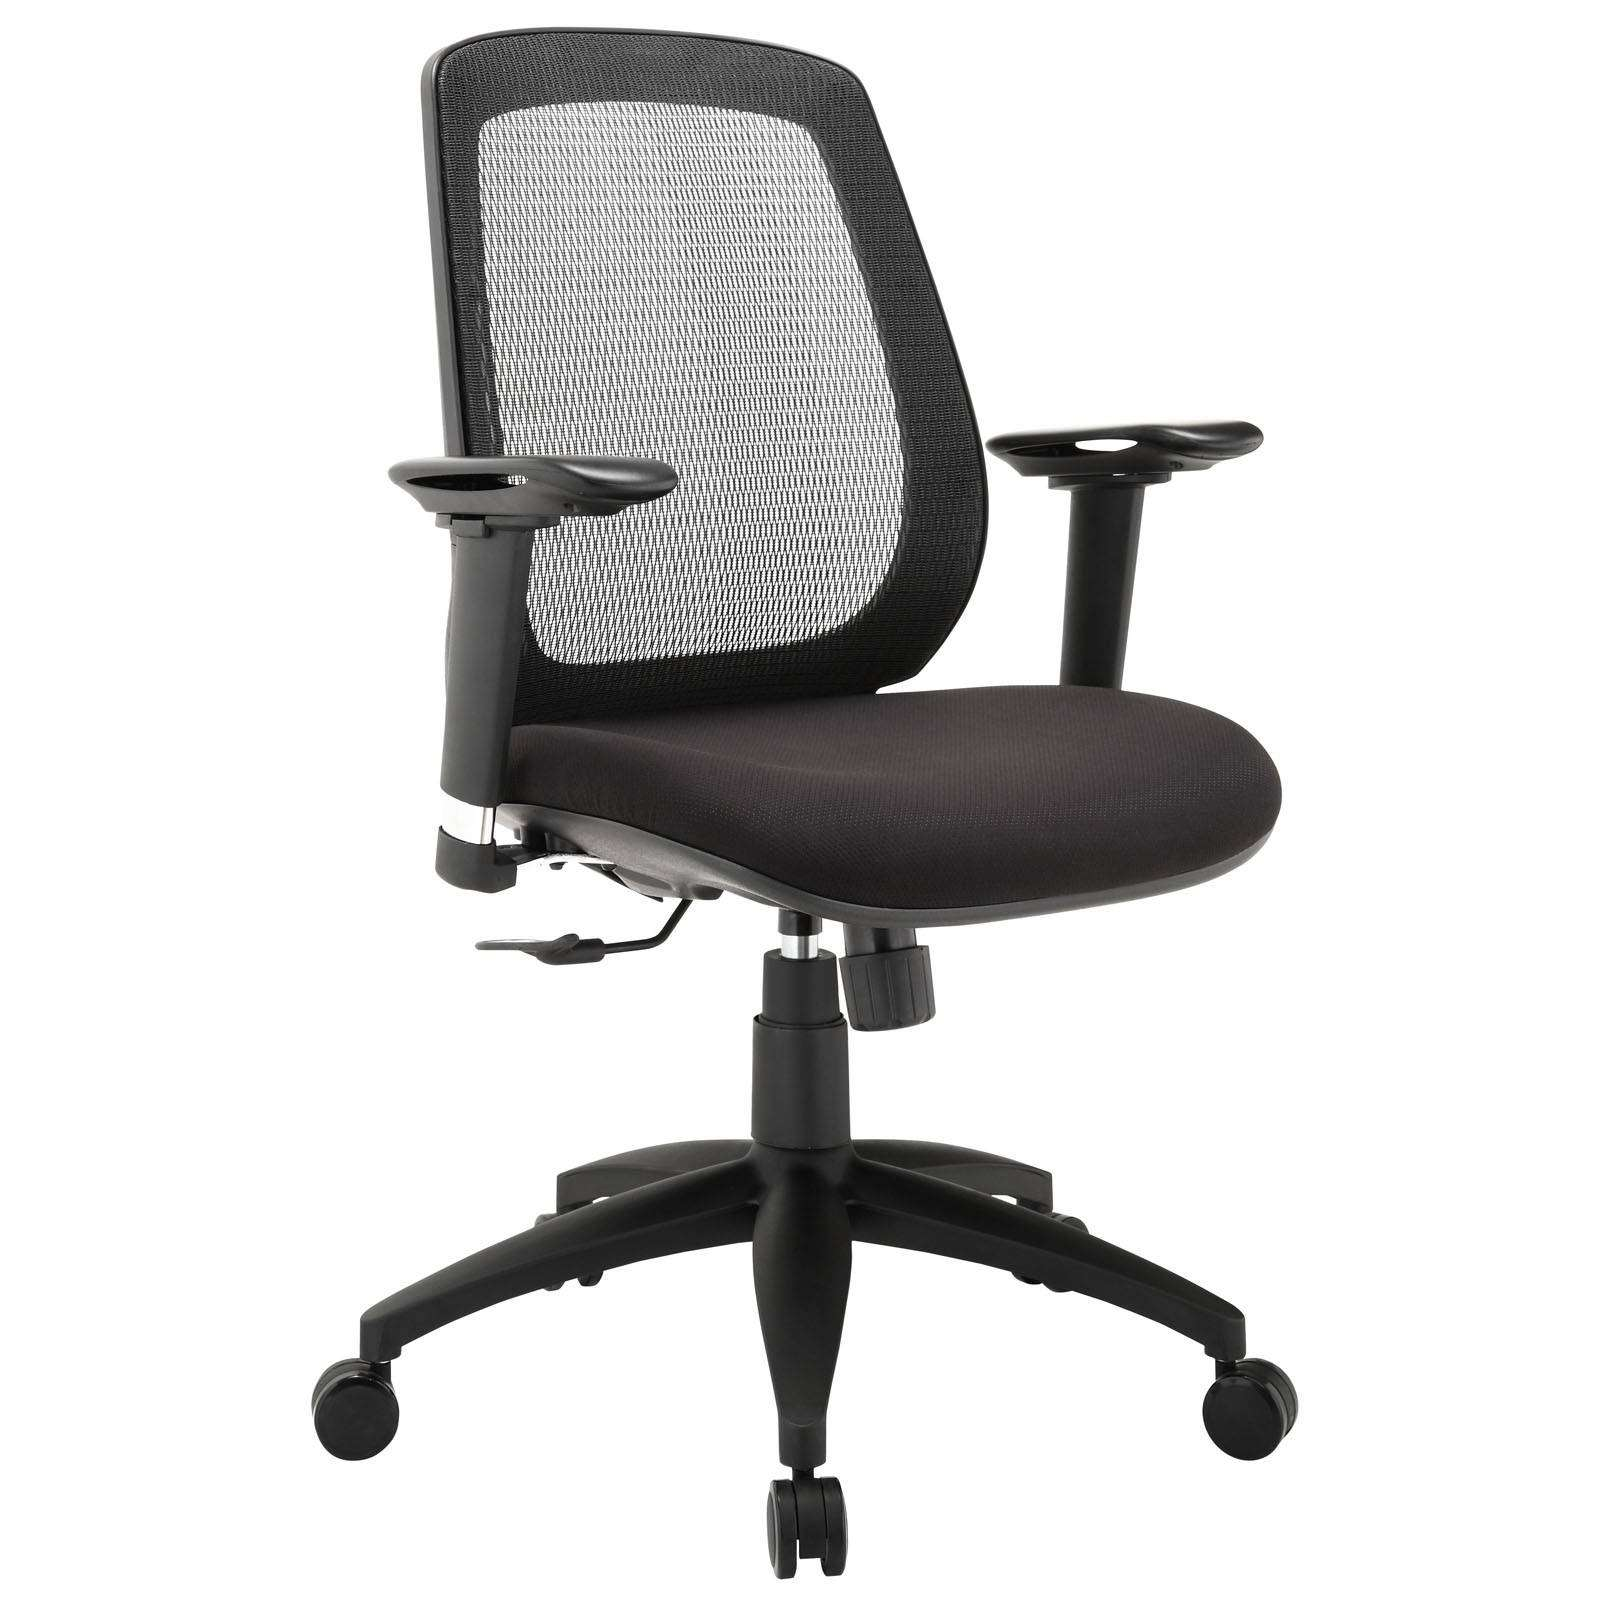 Cruise Adjustable Armrest Office Chair